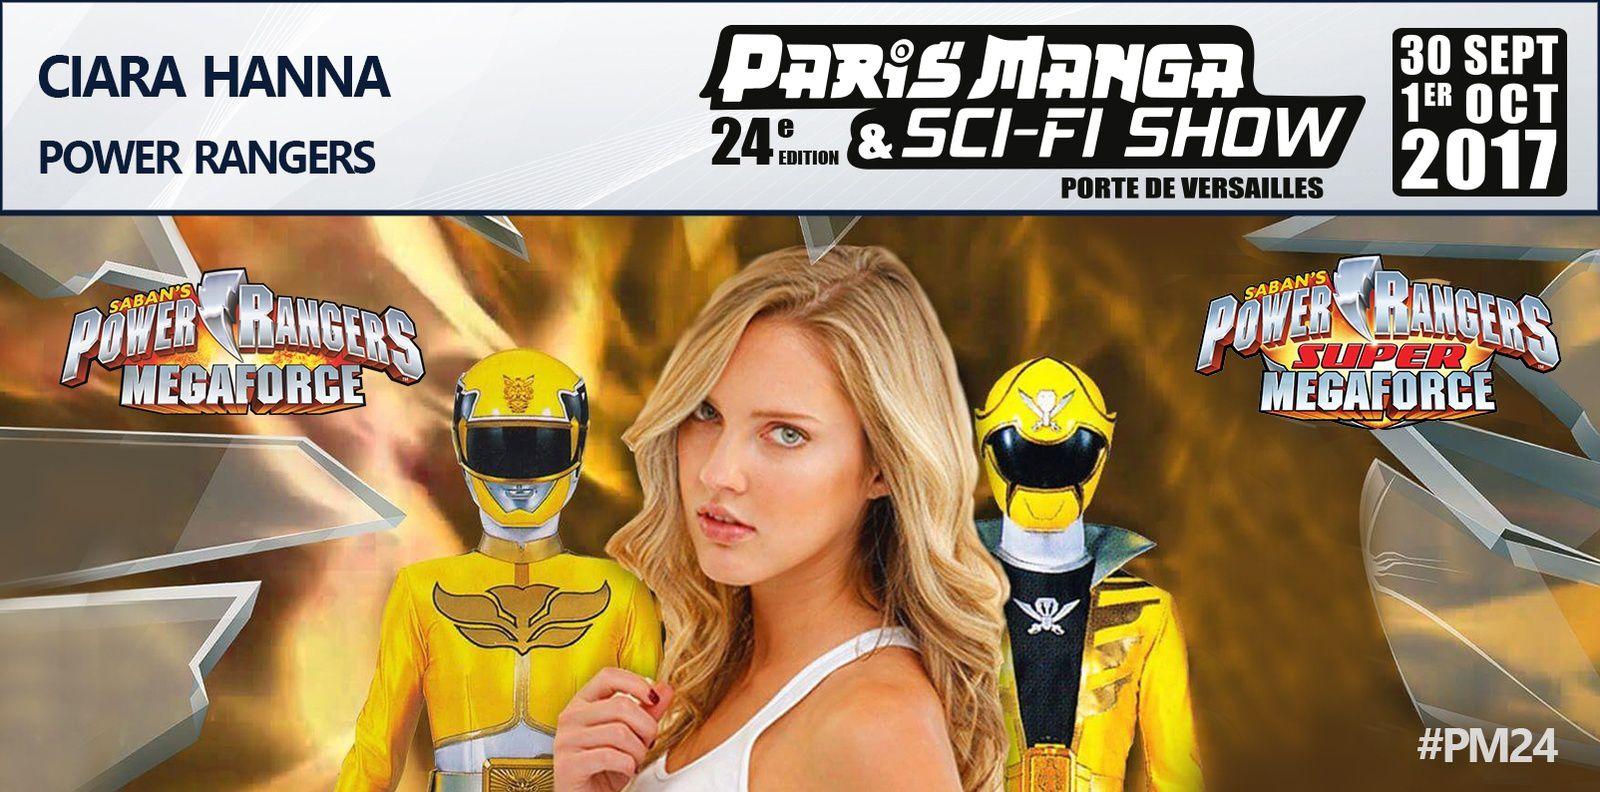 Les Power Rangers au PARIS MANGA &amp&#x3B; SCI-FI SHOW 24